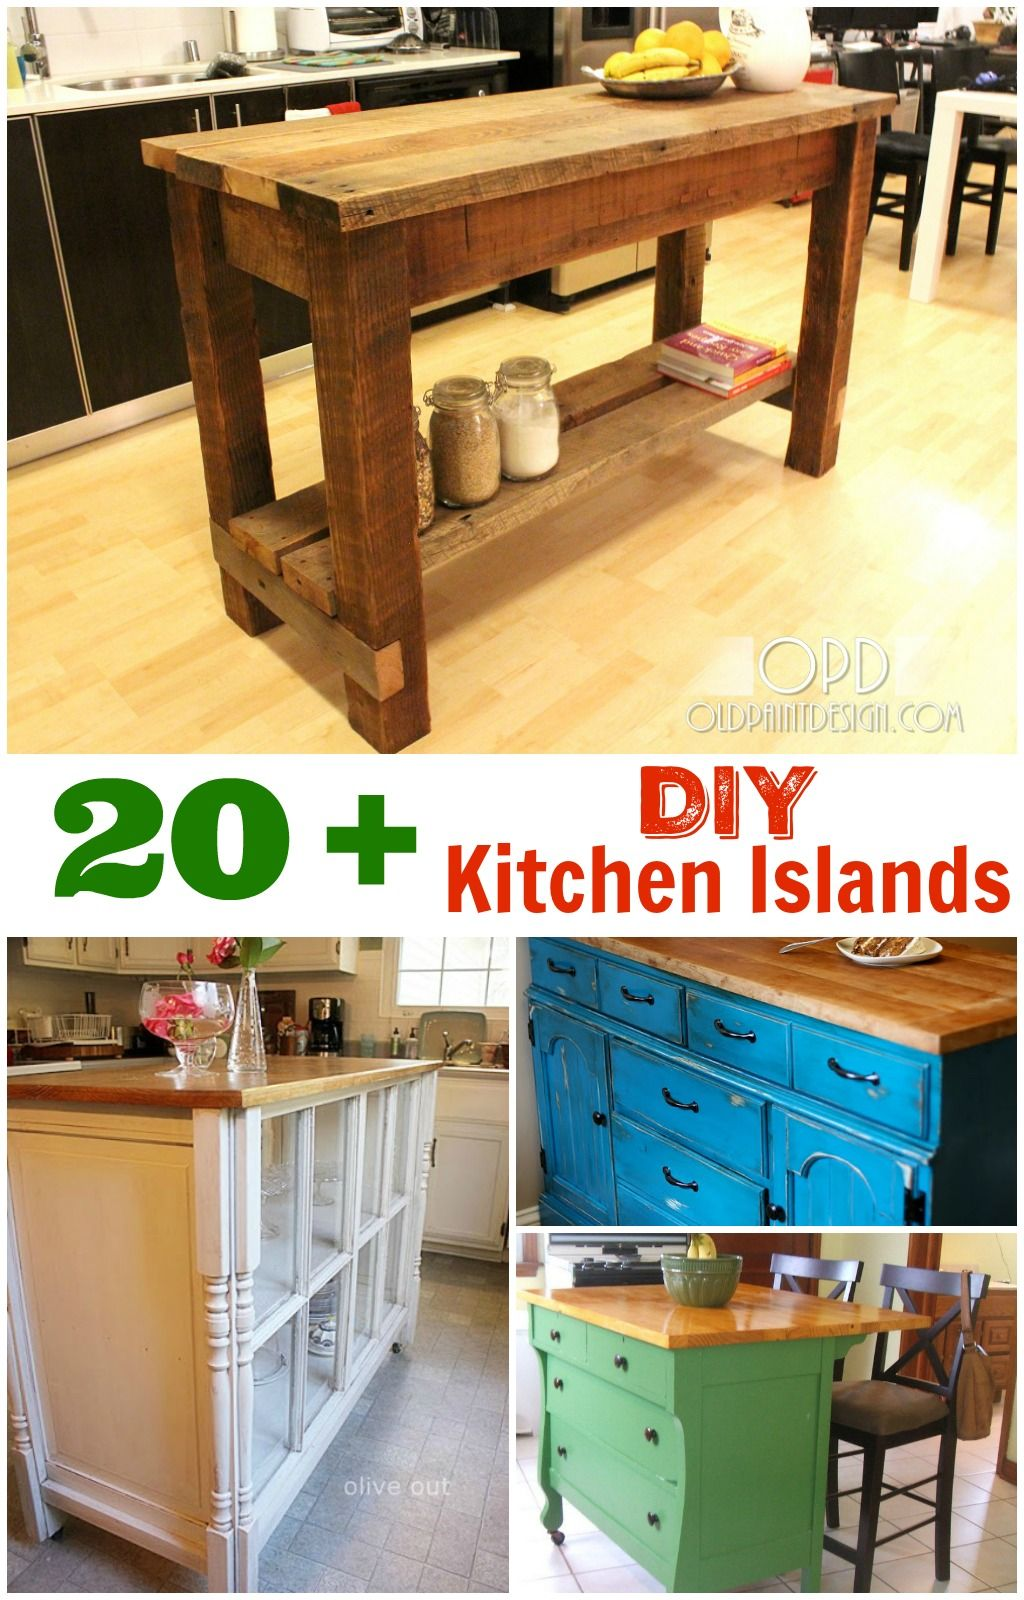 diy kitchen island ideas and inspiration diy kitchen island